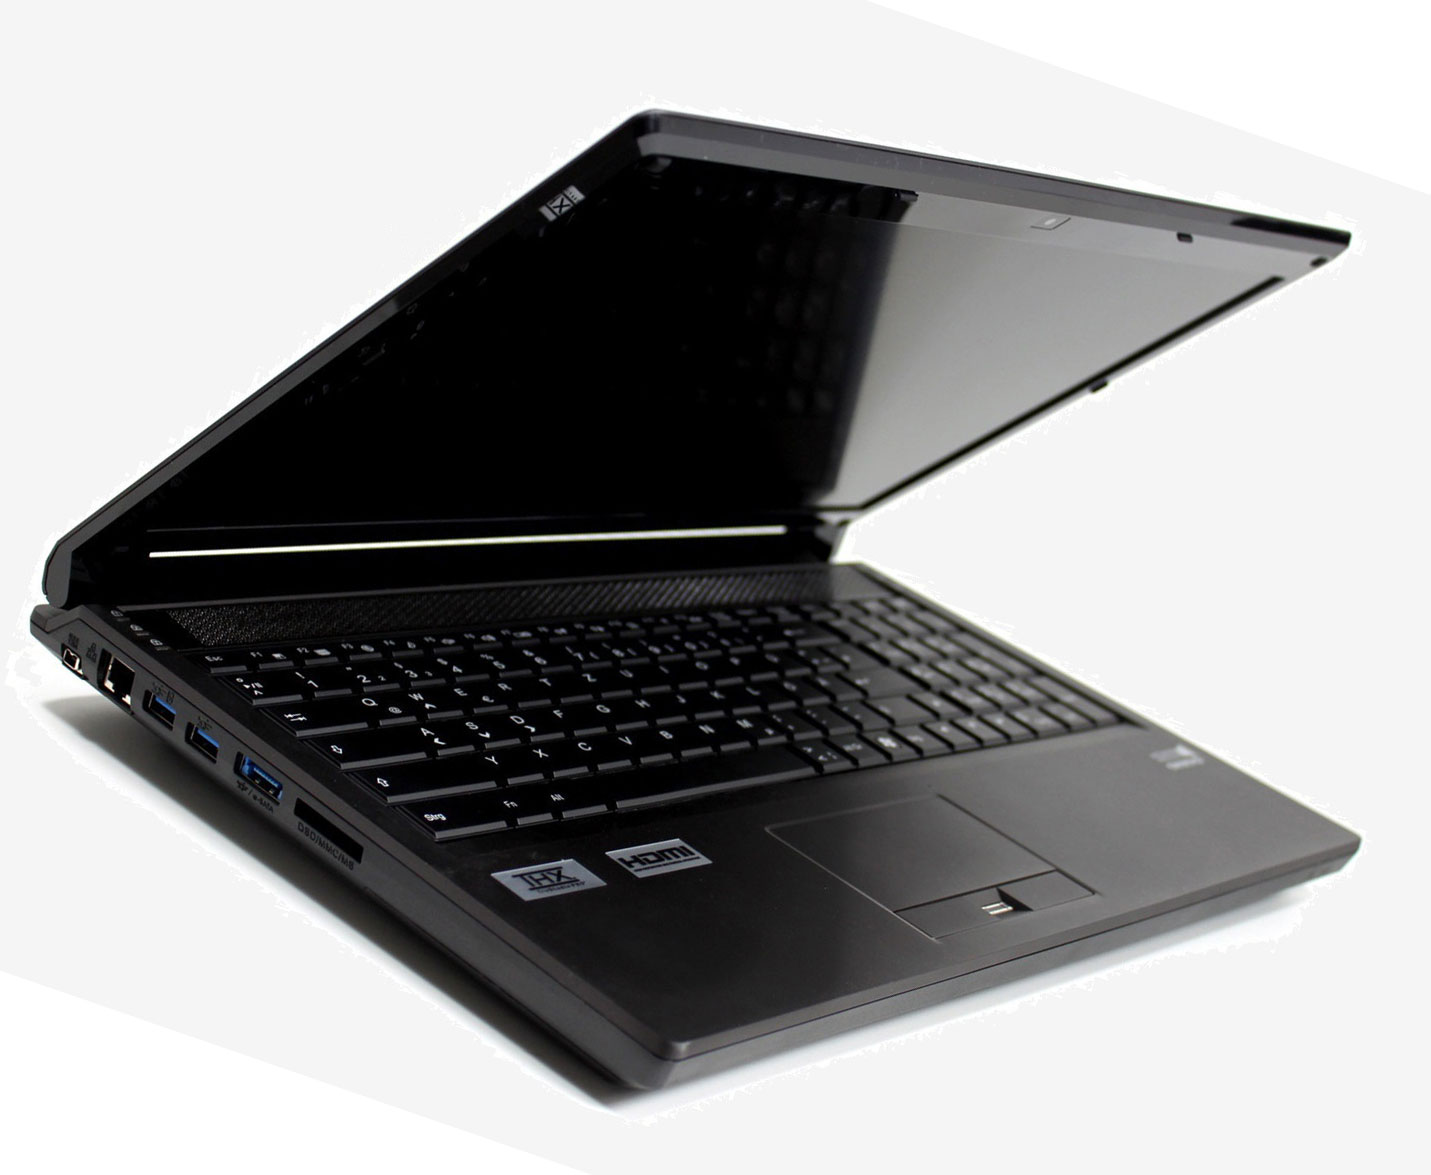 Ремонт ноутбуков ДЭКСП по низким ценам